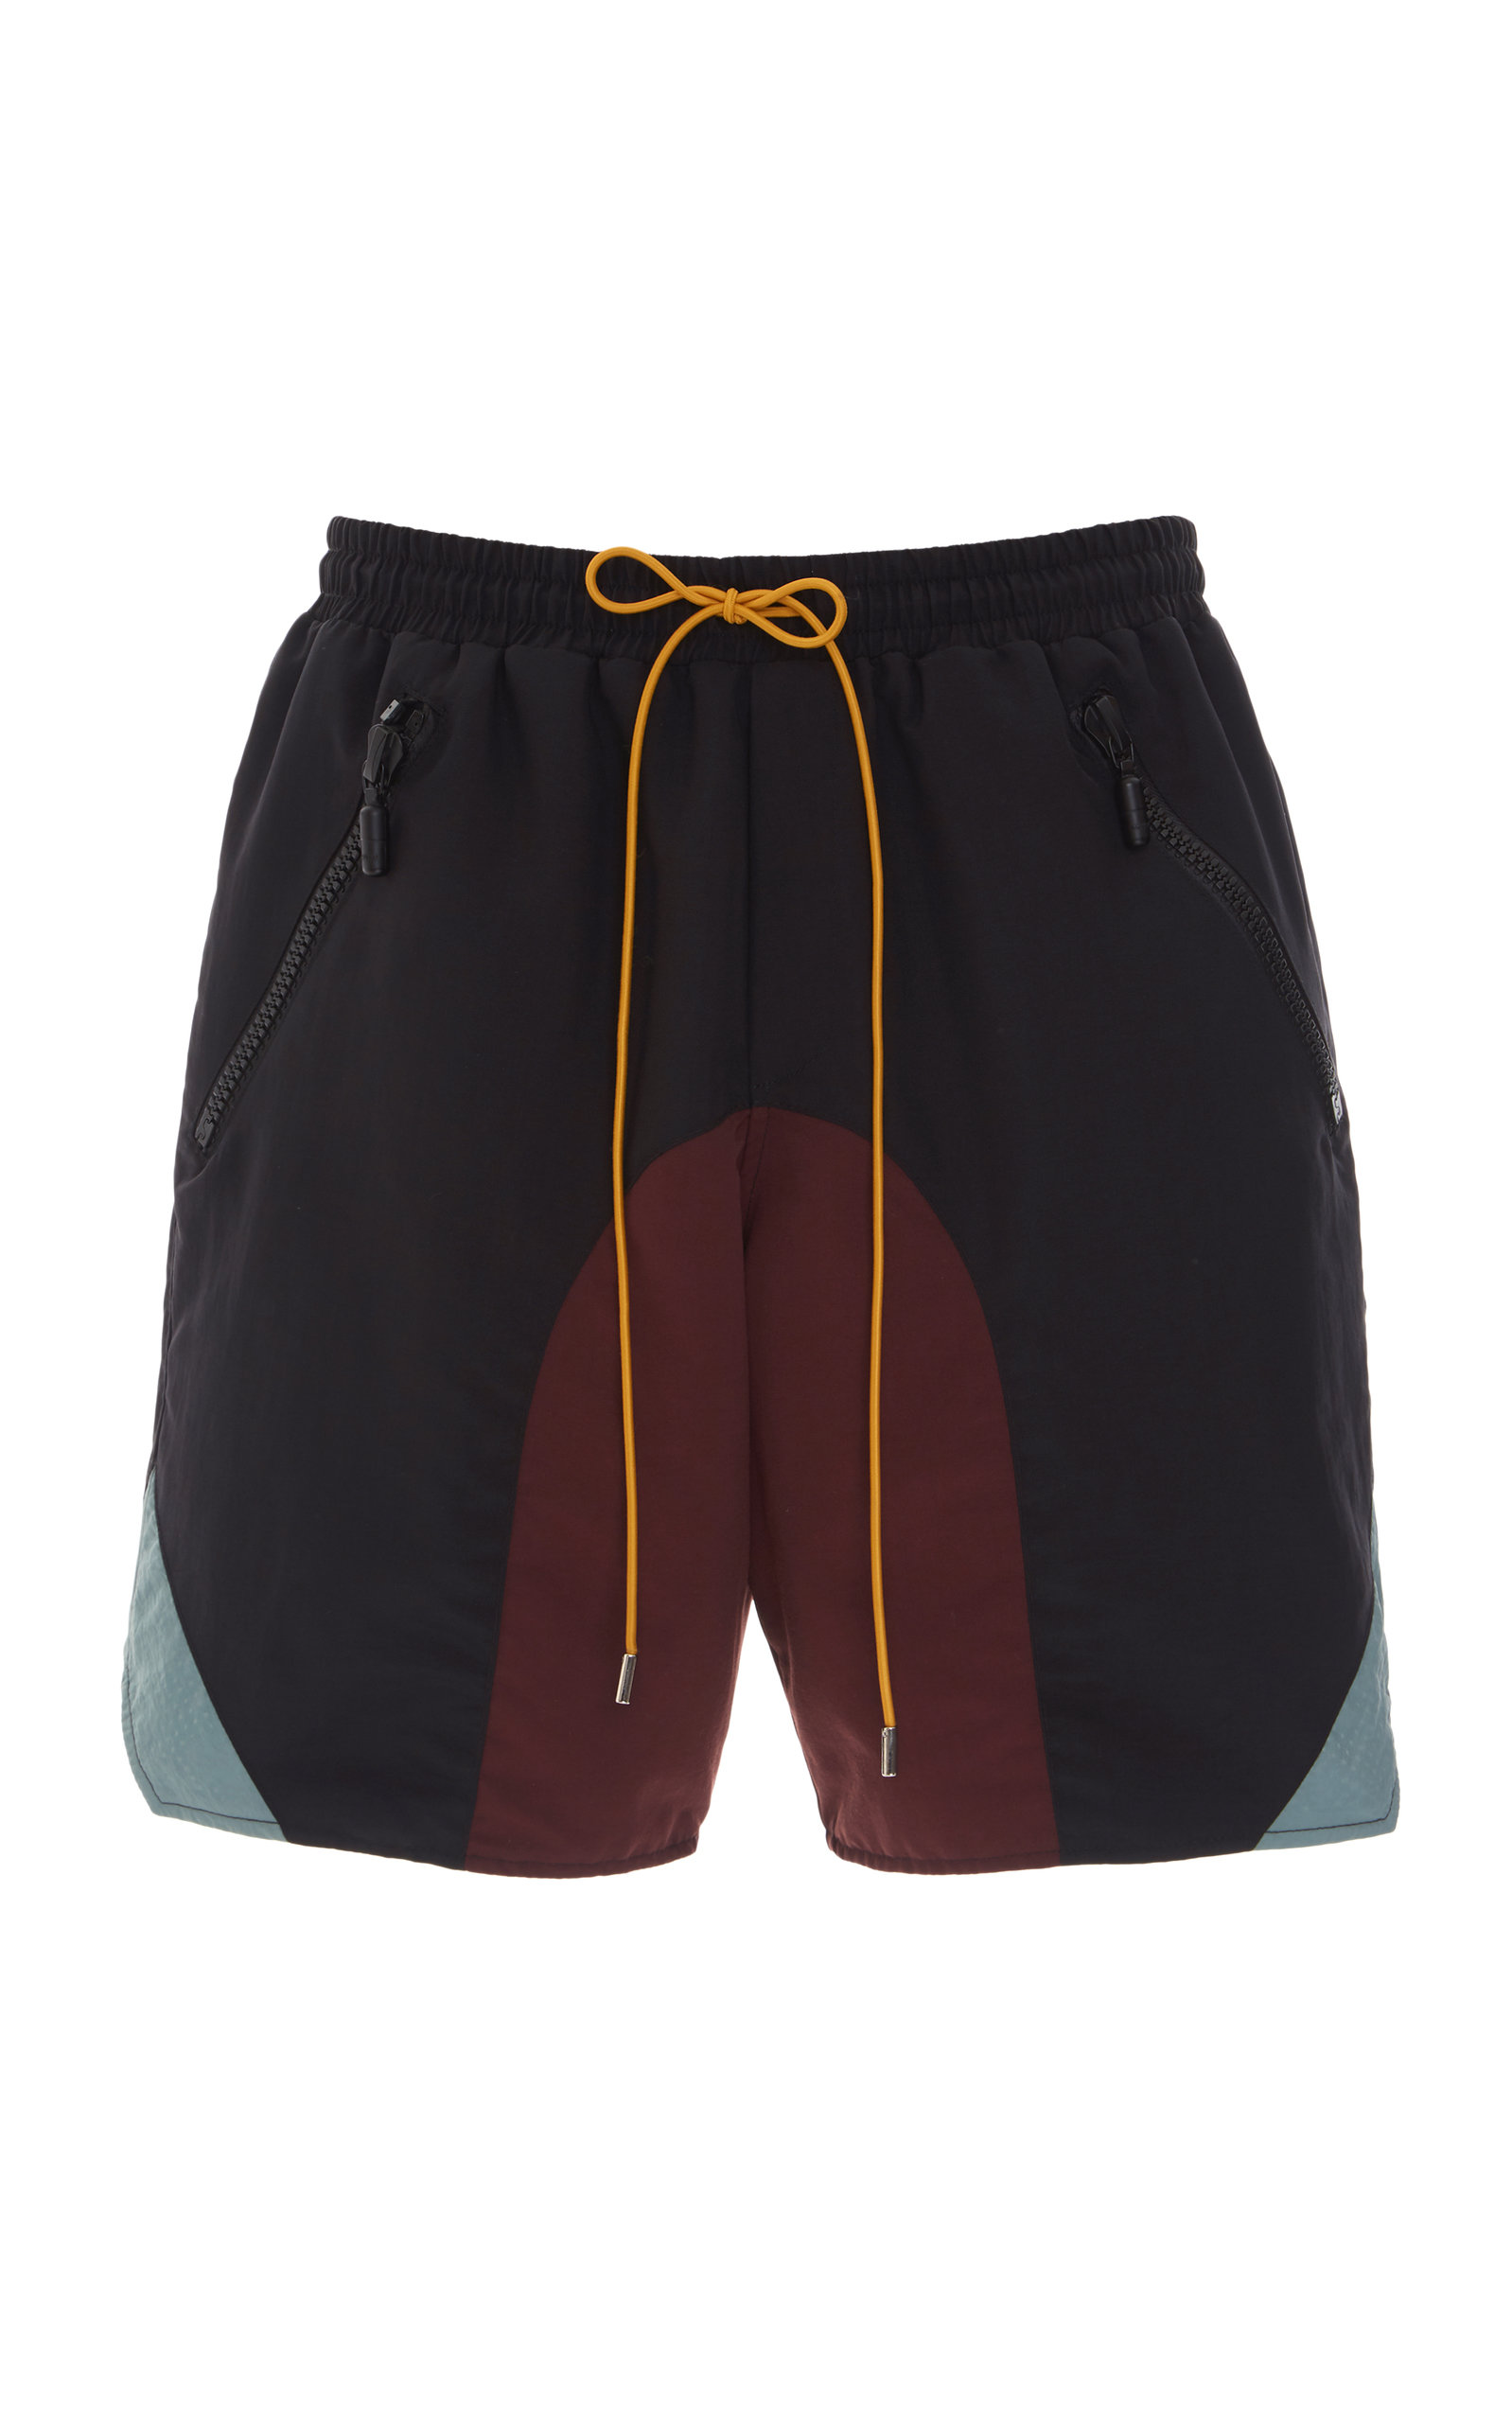 Rhude Shorts Colorblocked Shell Shorts